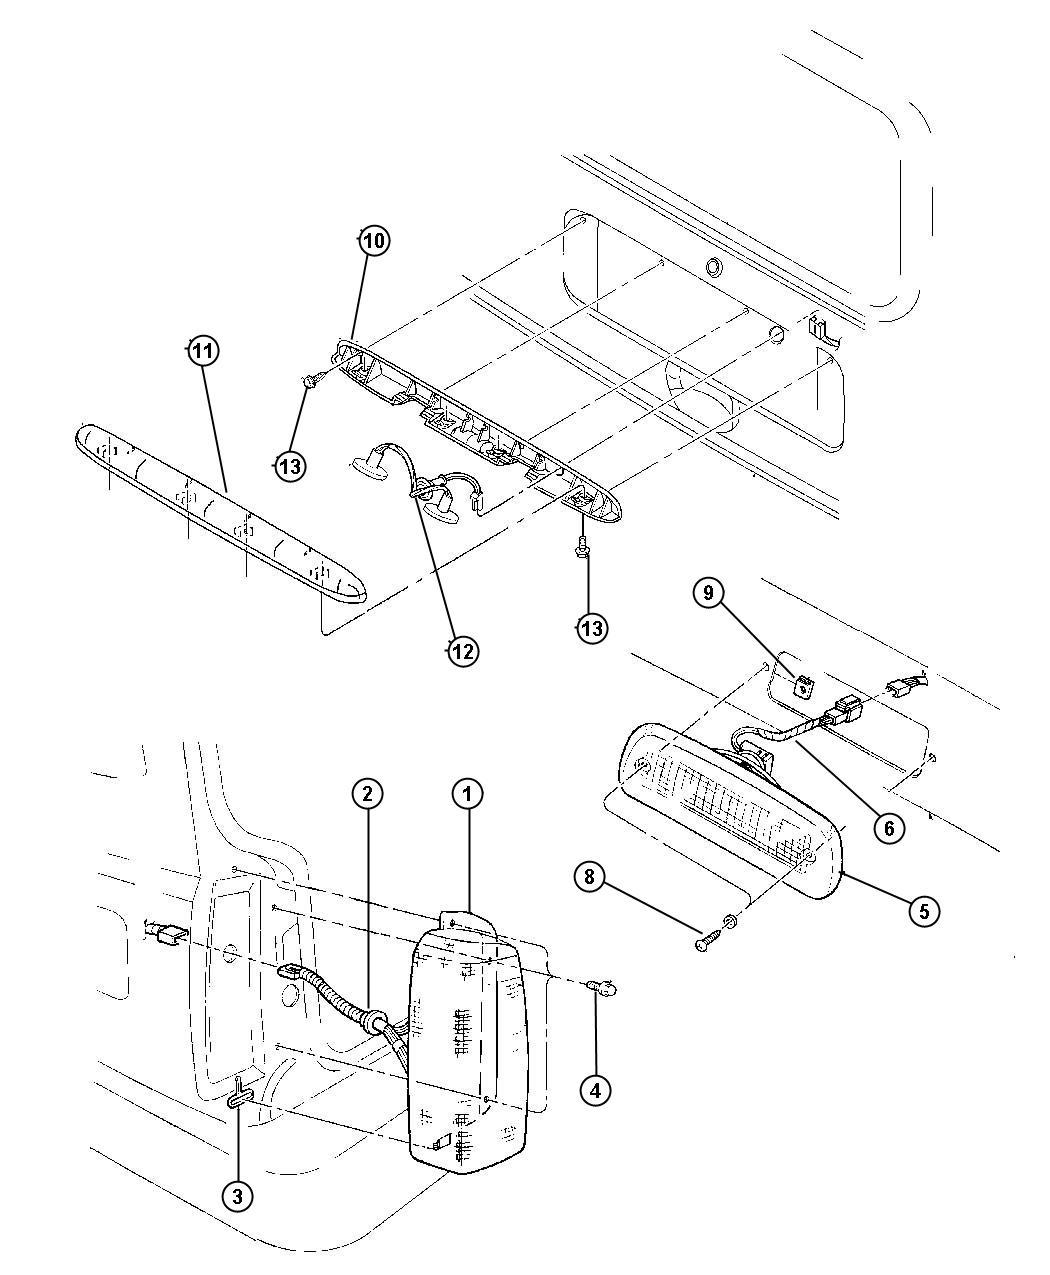 Jeep Cherokee Wiring. Taillamp. Usa/canada. Usacanada